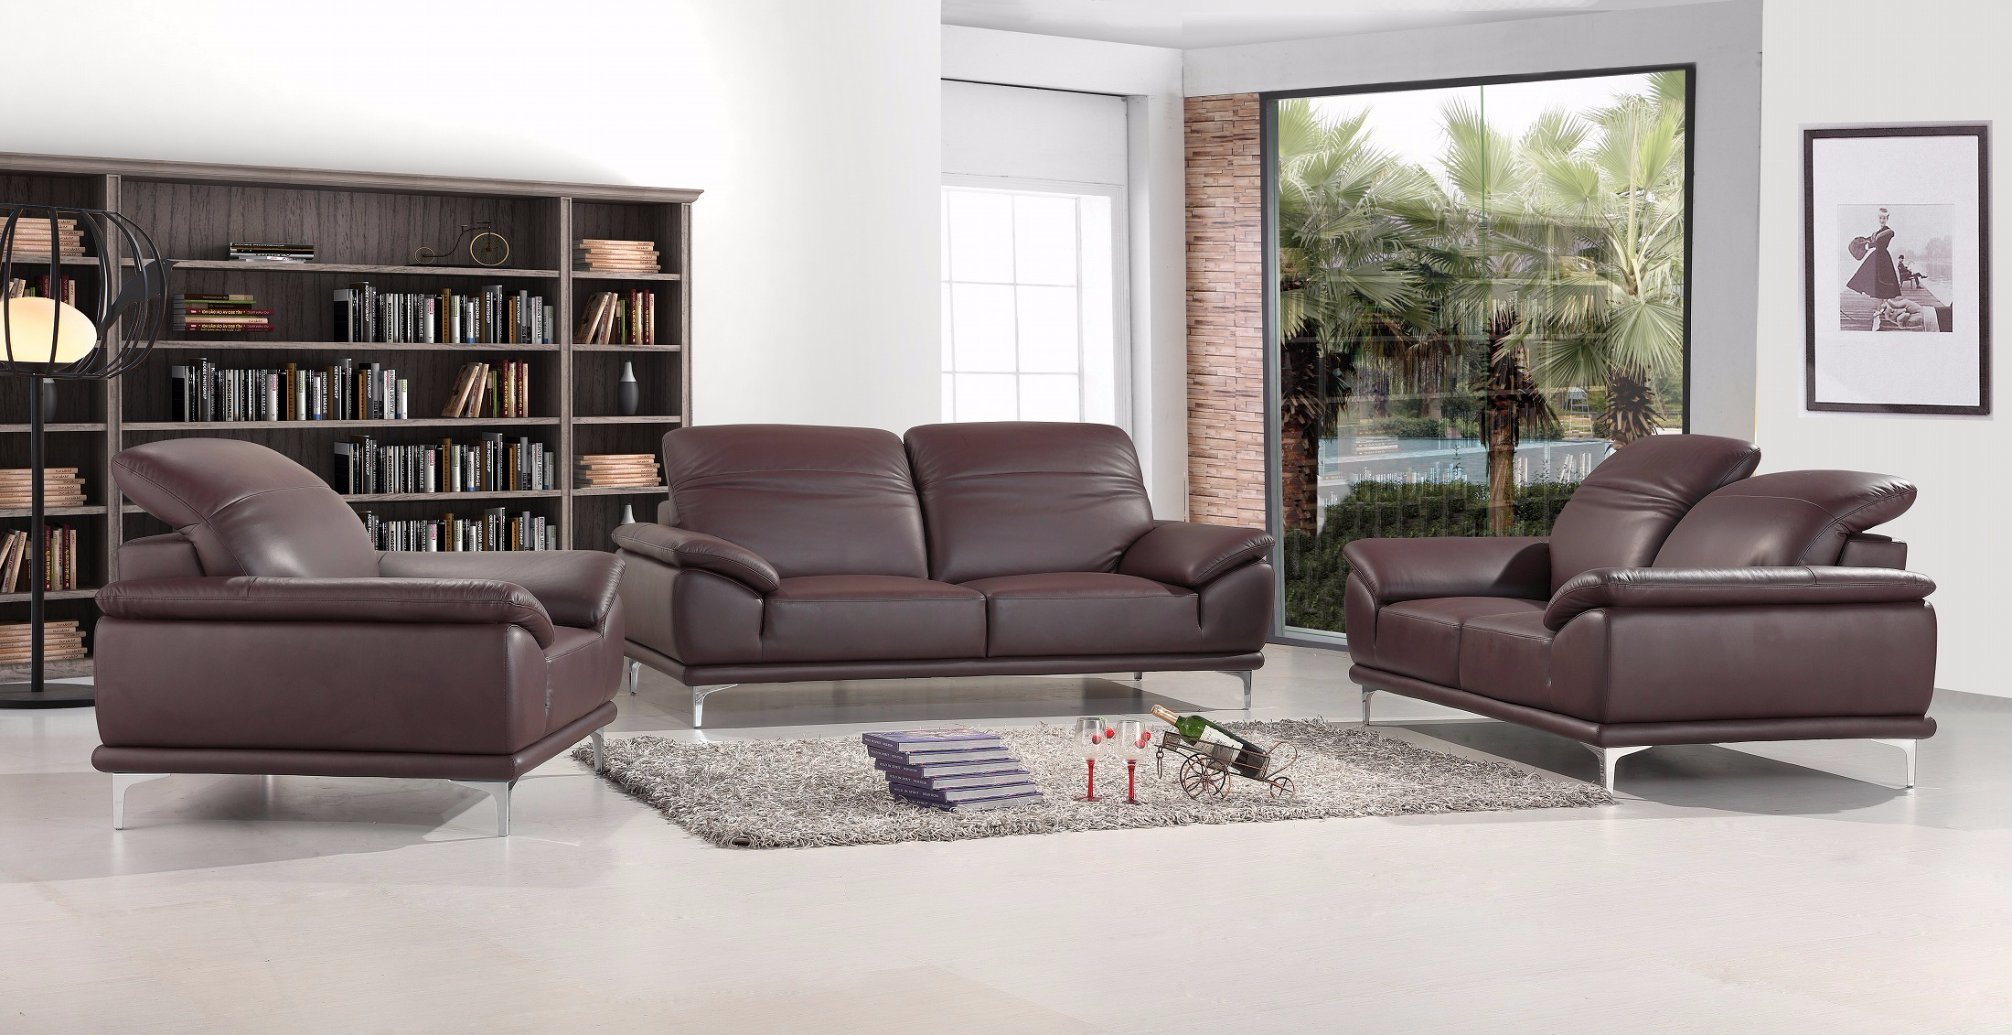 [Hot Item] European Modern Living Room Sofa Sectional Leather Sofa Sbl-1719  1+2+3